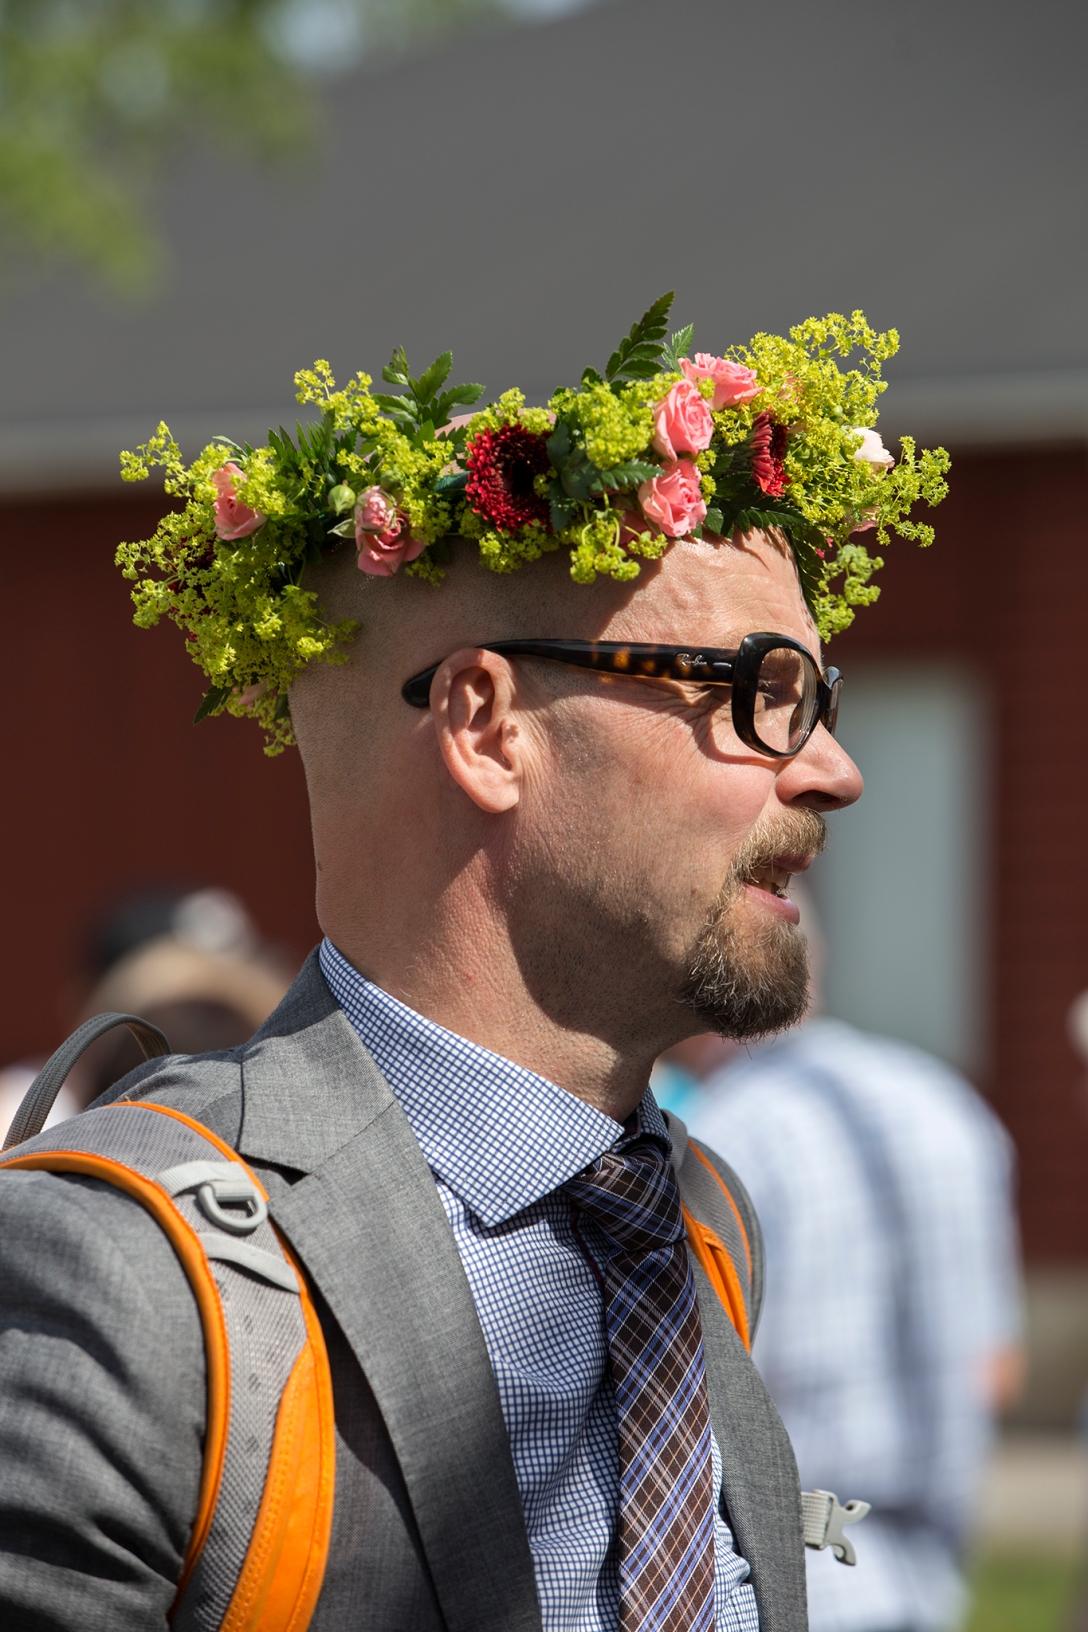 Blomsterpojken 2048